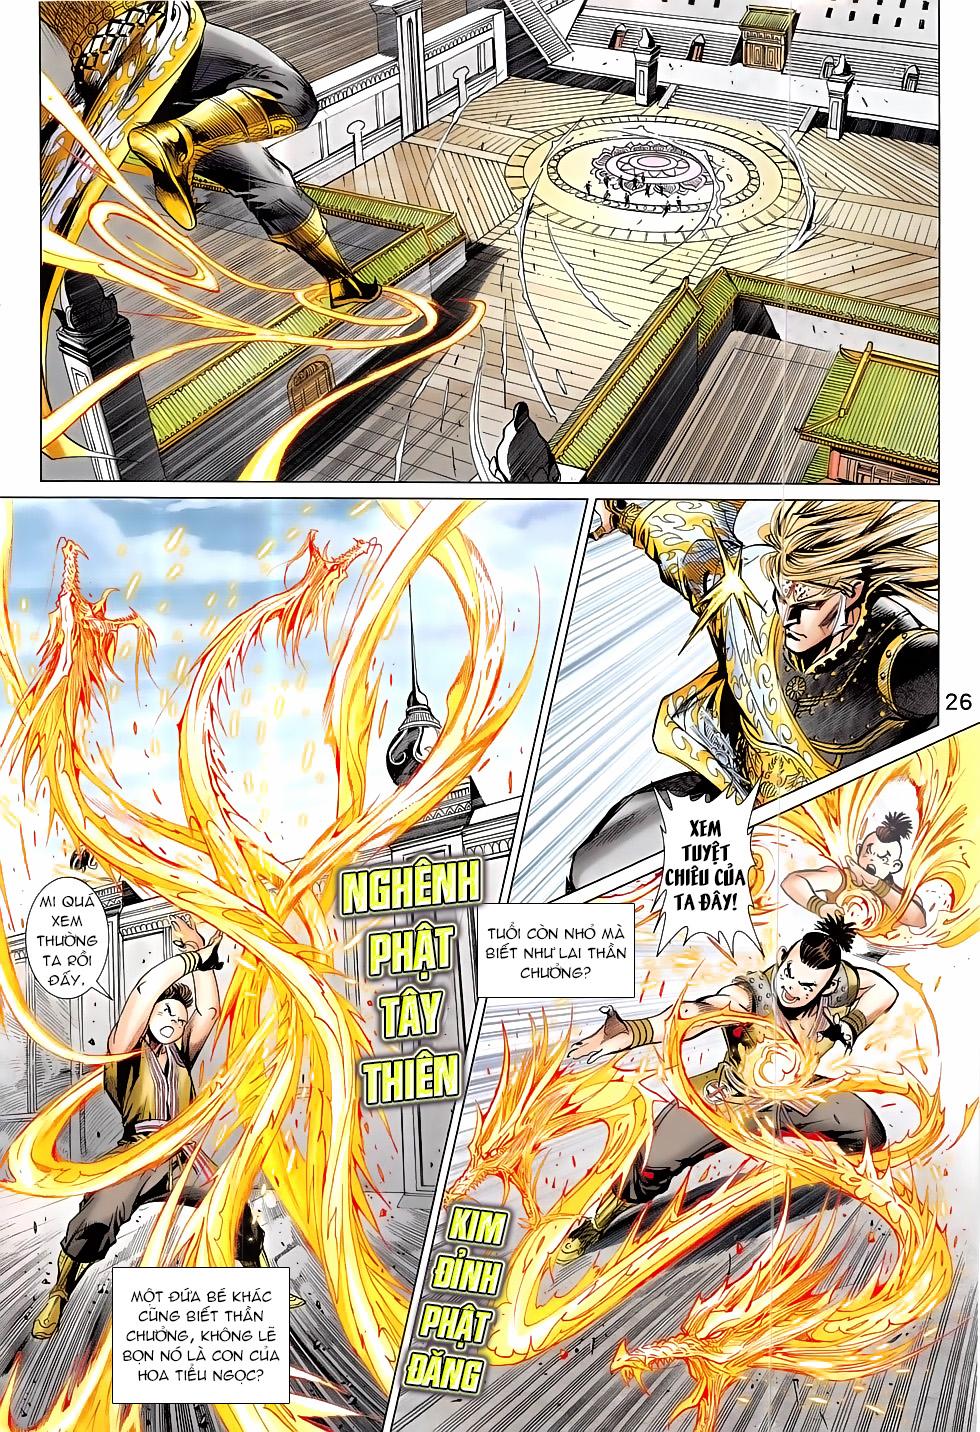 Thần Chưởng chap 24 – End Trang 26 - Mangak.info